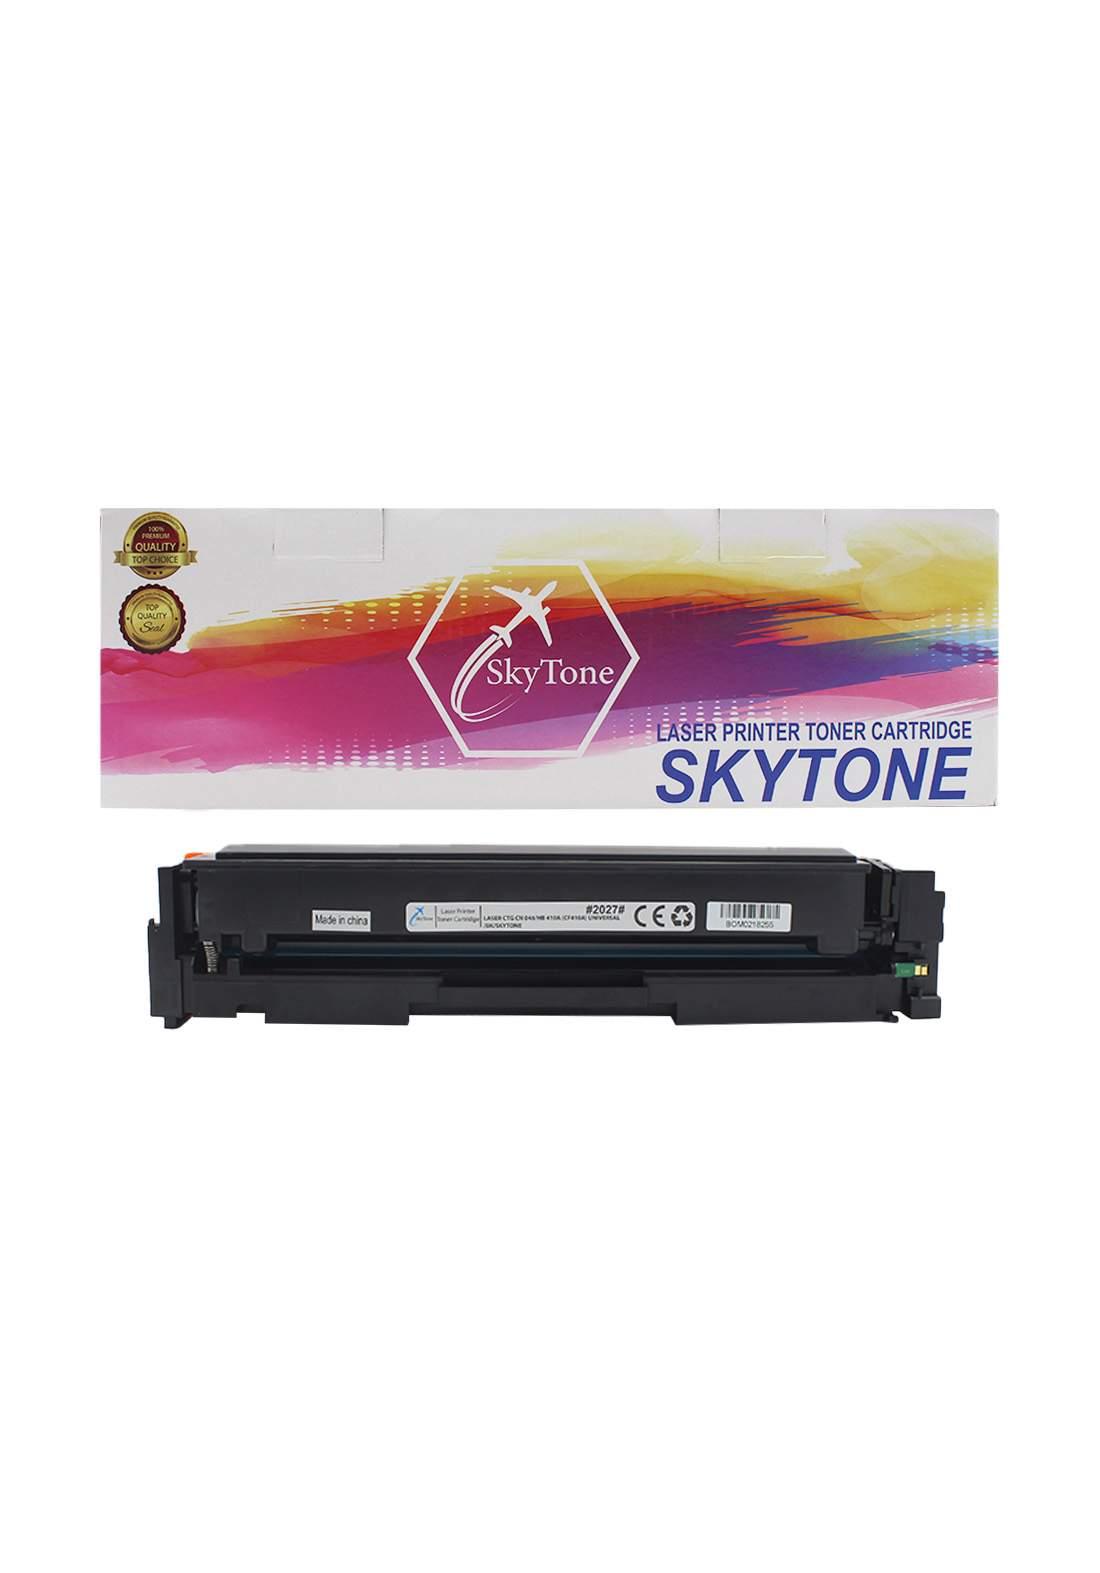 SKYTONE CTG Canon 046/HP 410A (CF410A) Universal Laser Printer Toner Cartridge خرطوشة حبر